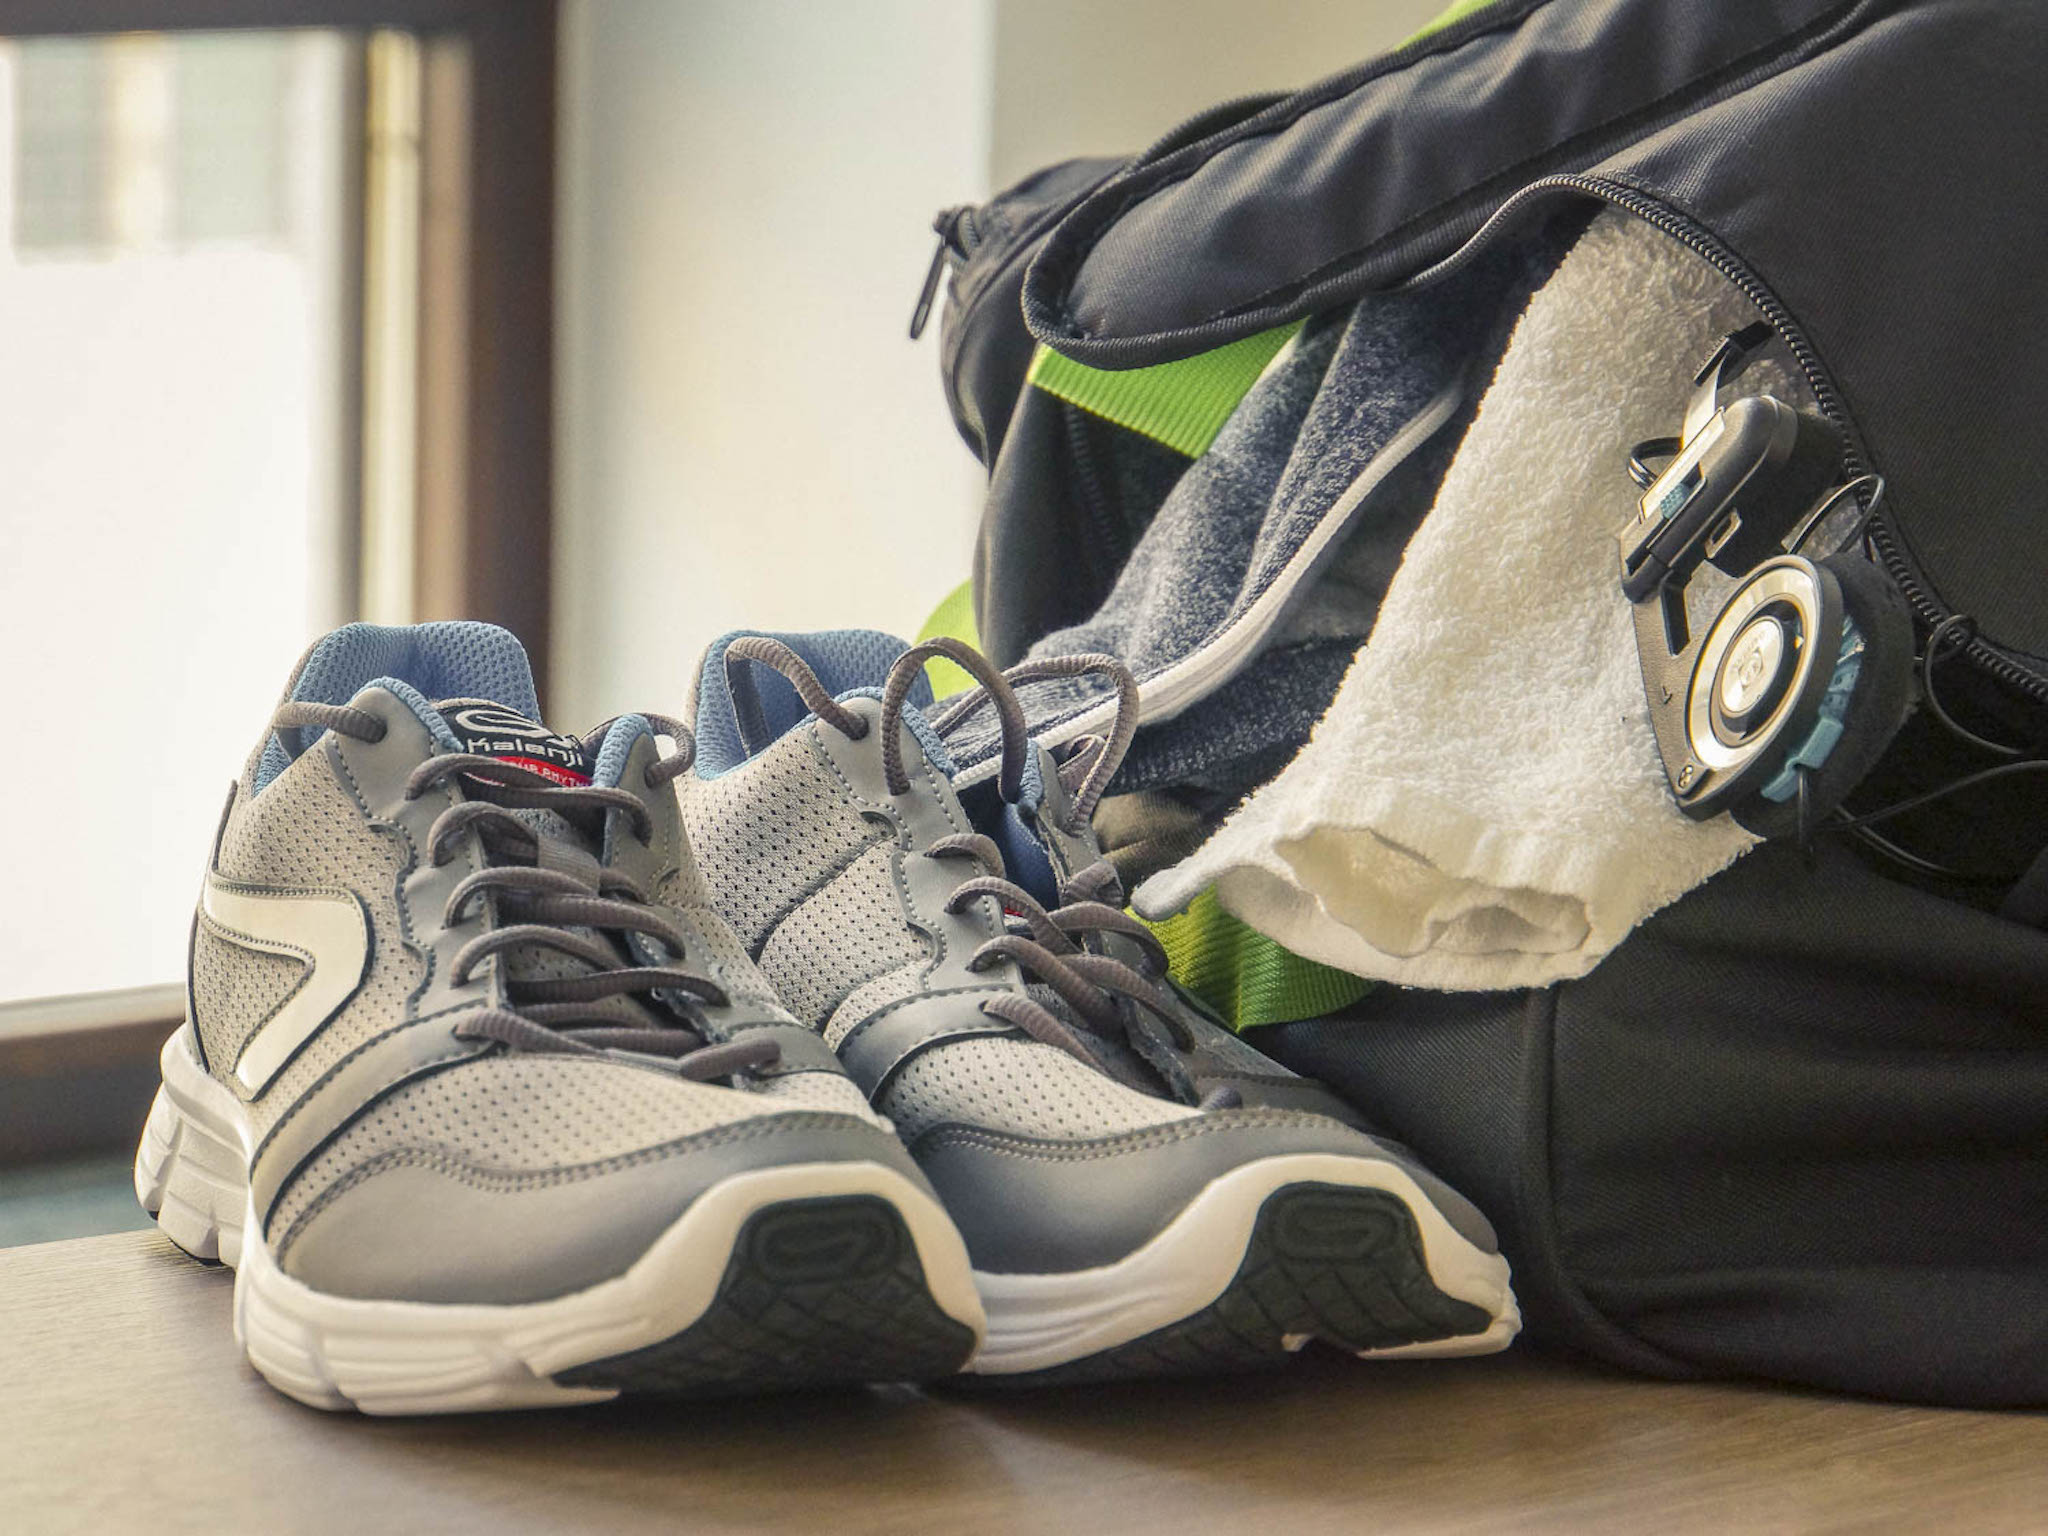 Symbolbild Fitness und Sport. Foto: Dominik Ziegler